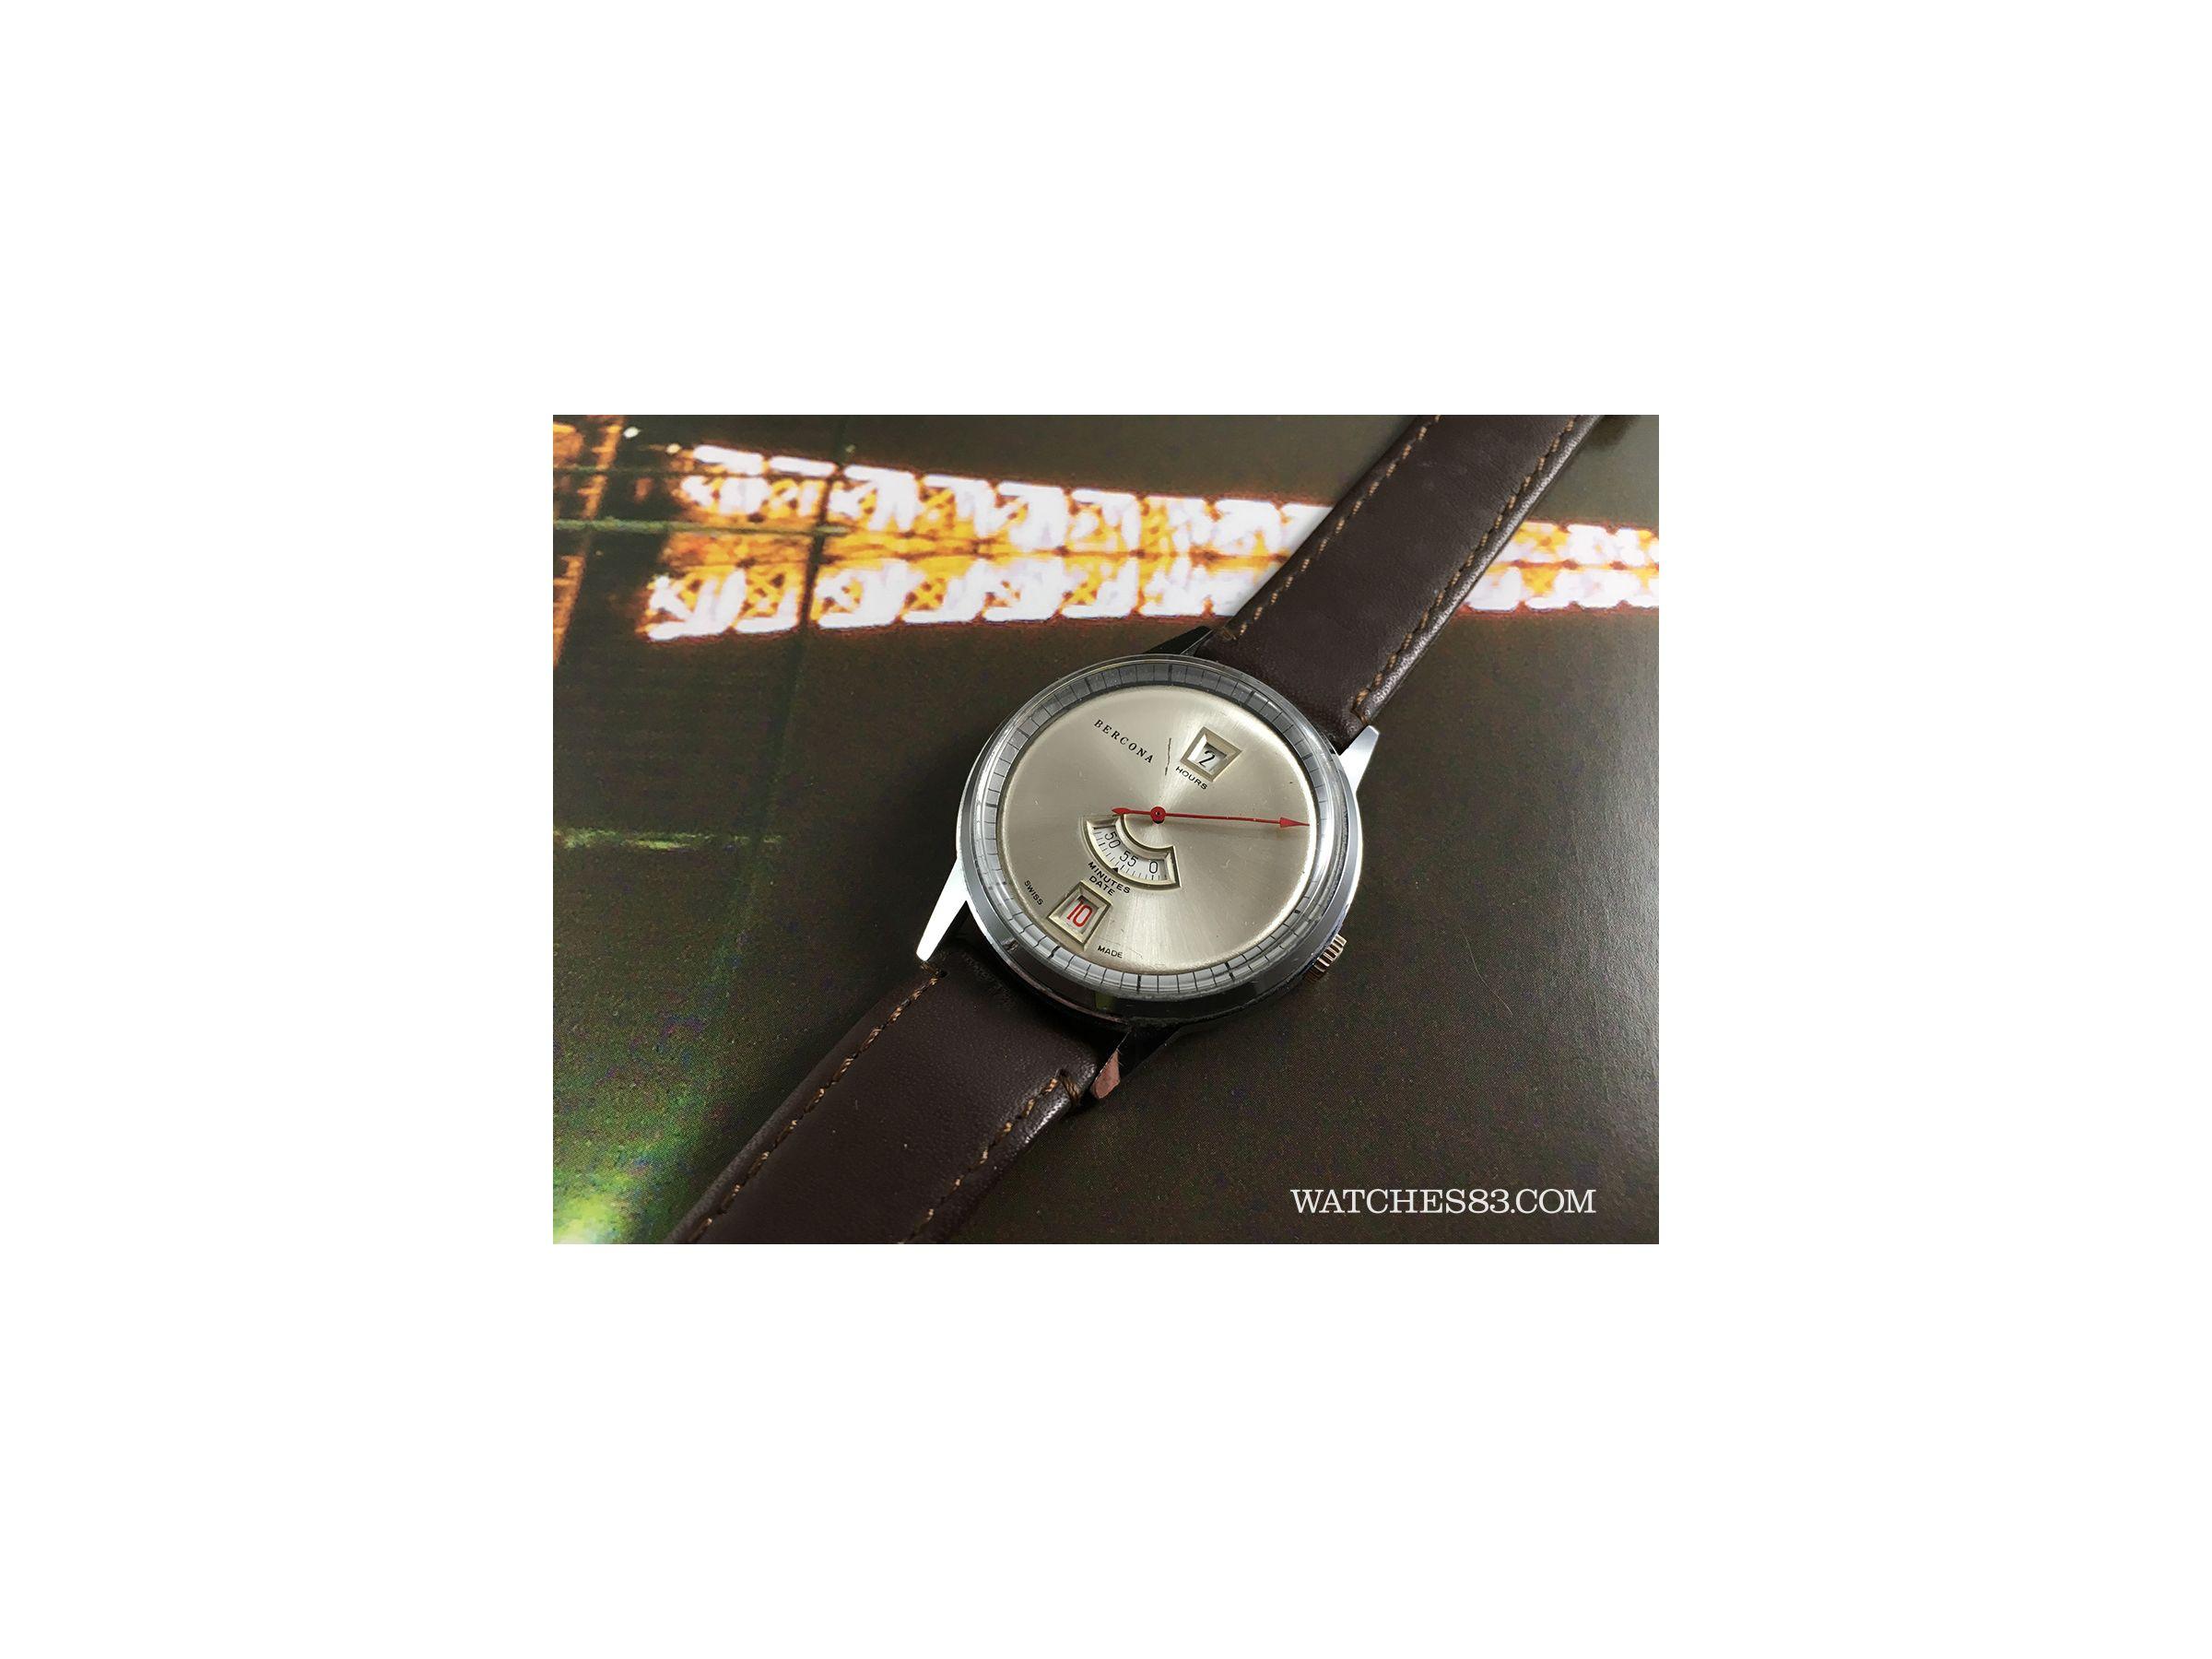 Vintage Swiss Hand Winding Watch Bercona Jump Hour Bercona Vintage Watches Watches83